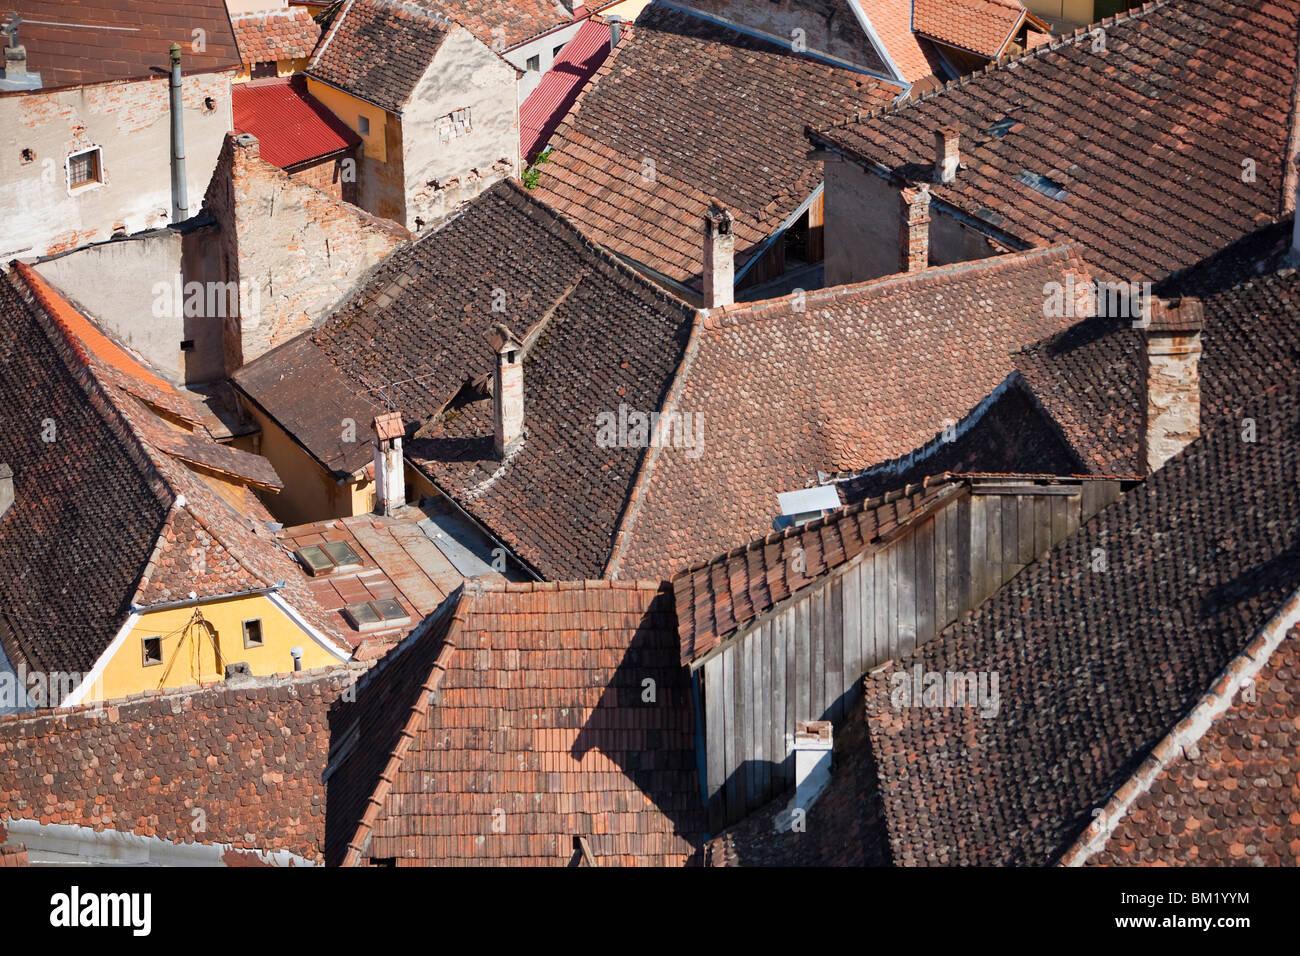 Roofs, Sighisoara, UNESCO World Heritage Site, Transylvania, Romania, Europe - Stock Image